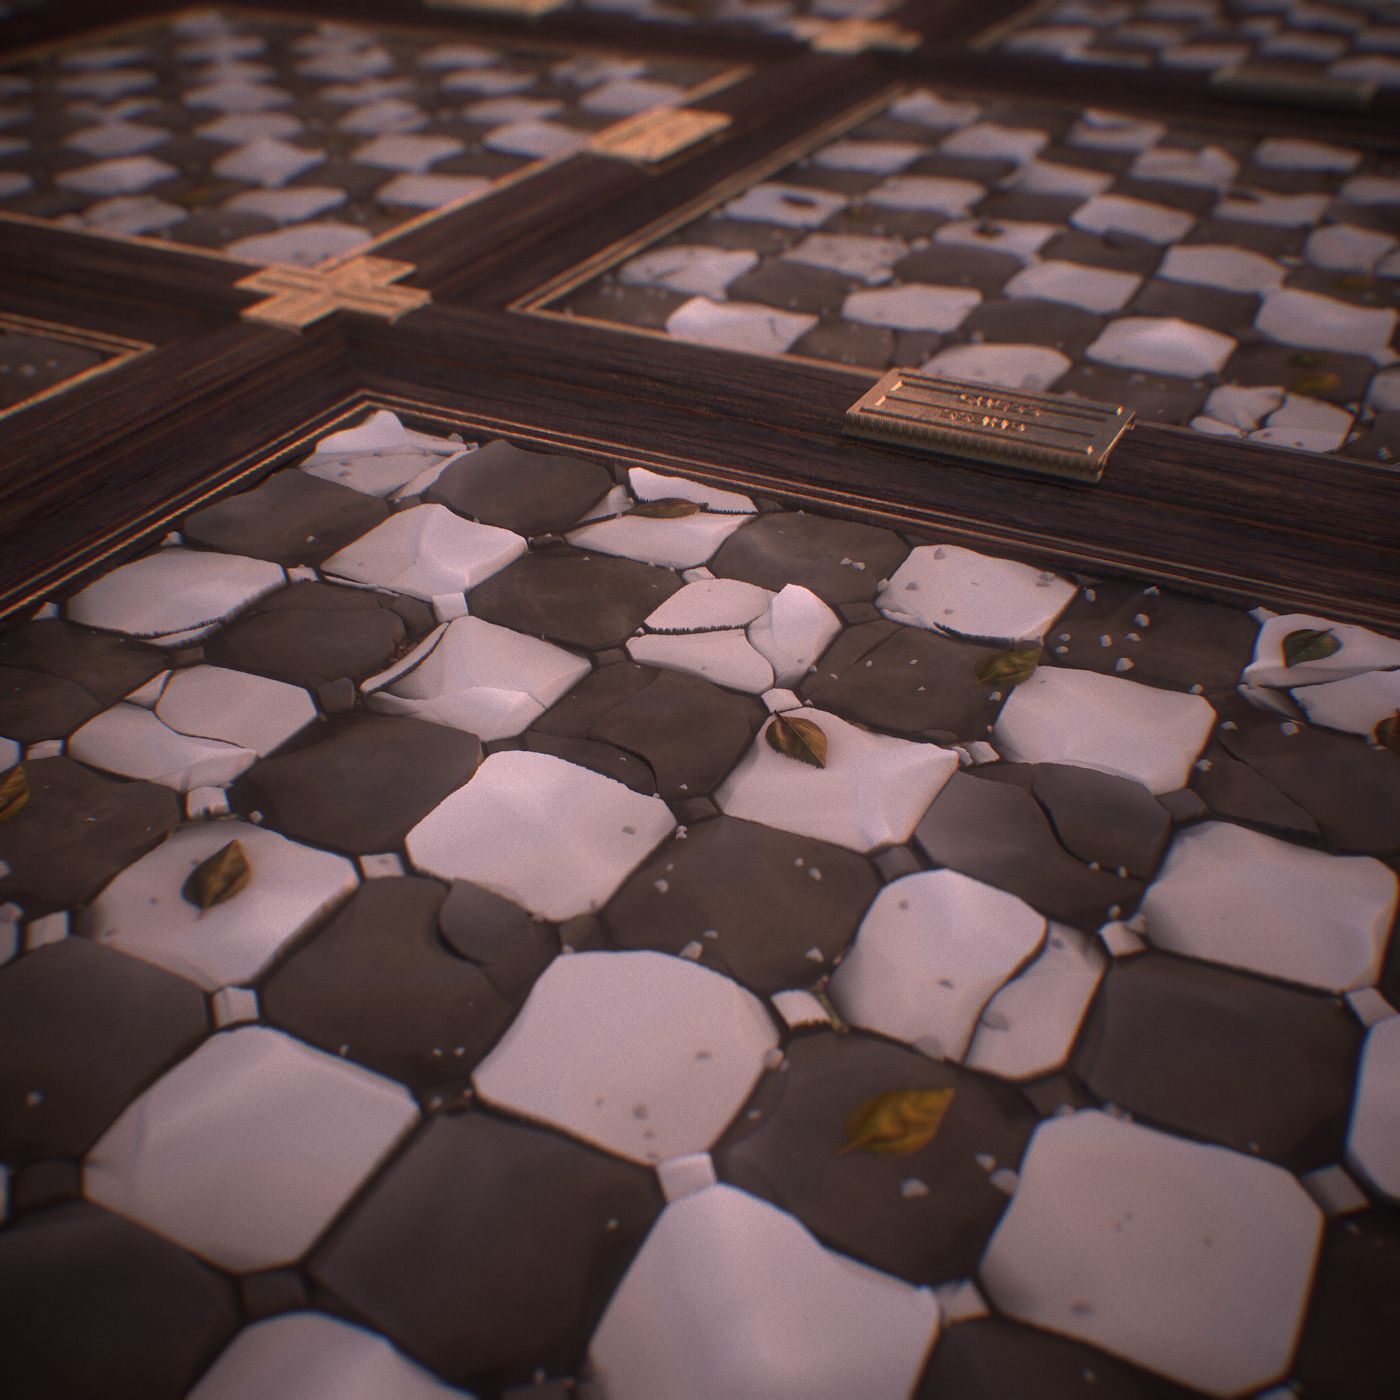 Chessboard Arthurtasquin